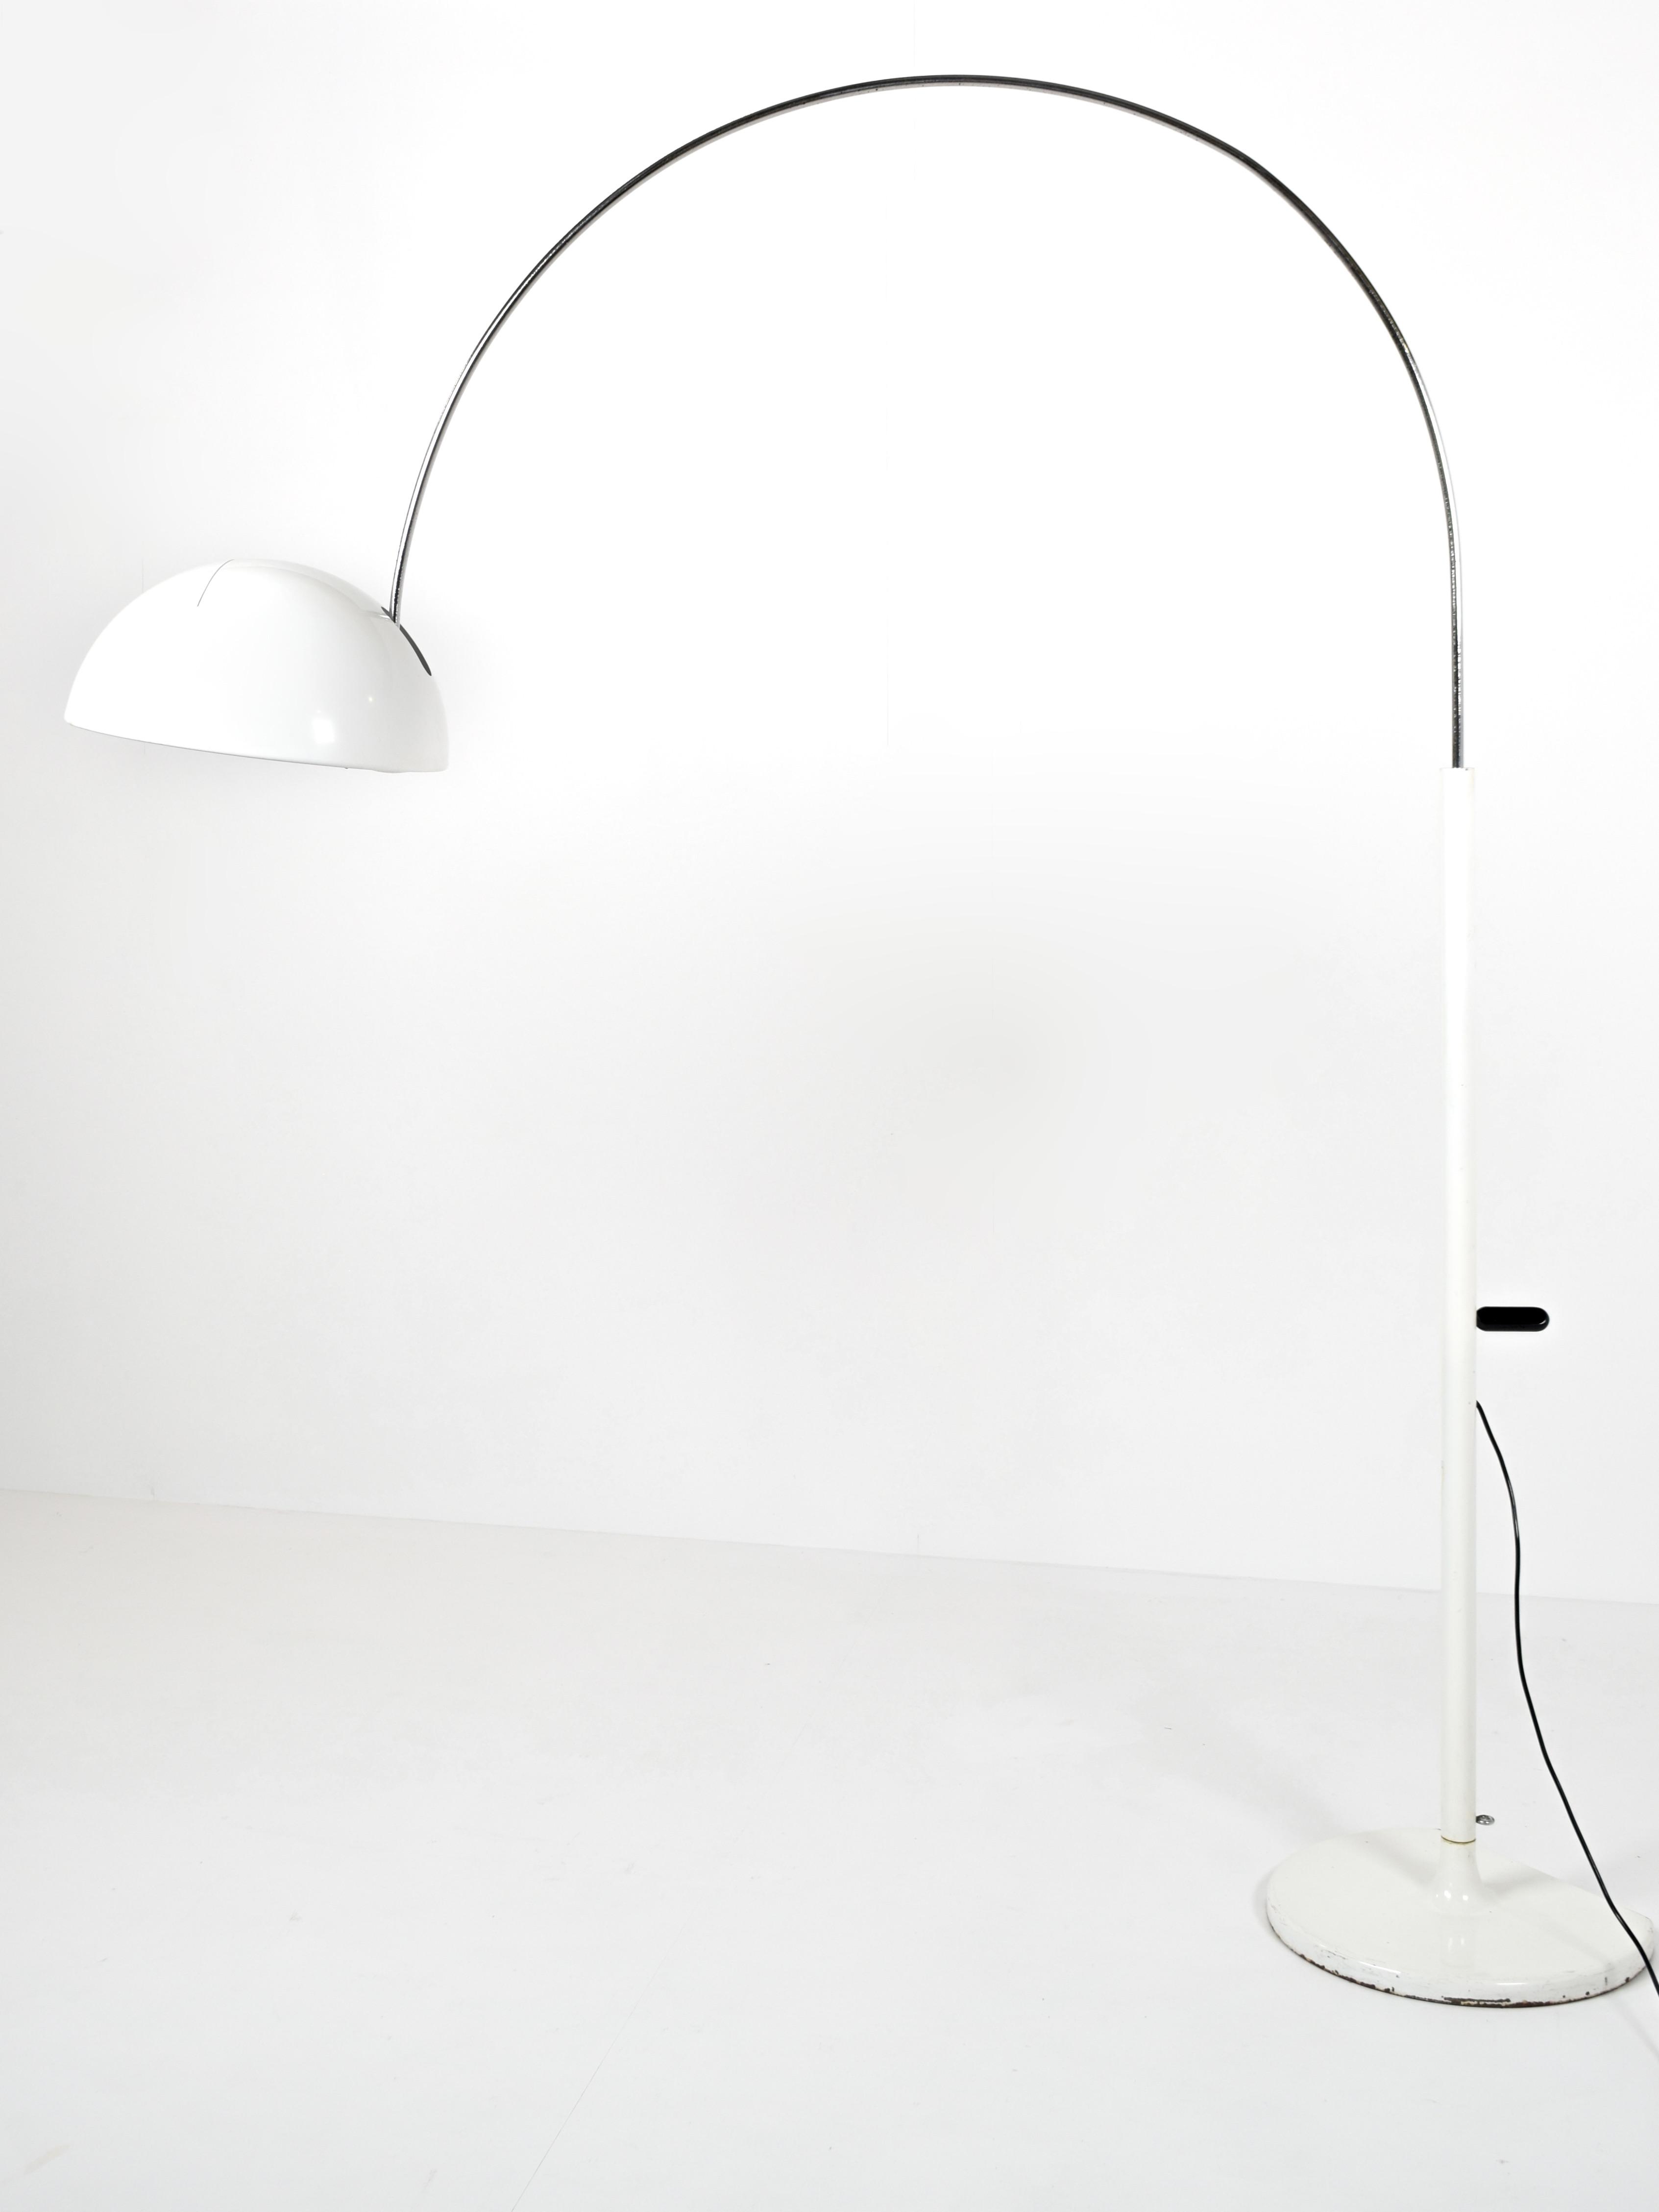 Joe Colombo Floor Lamp 'Coupe' for Oluce, Italy 1960s